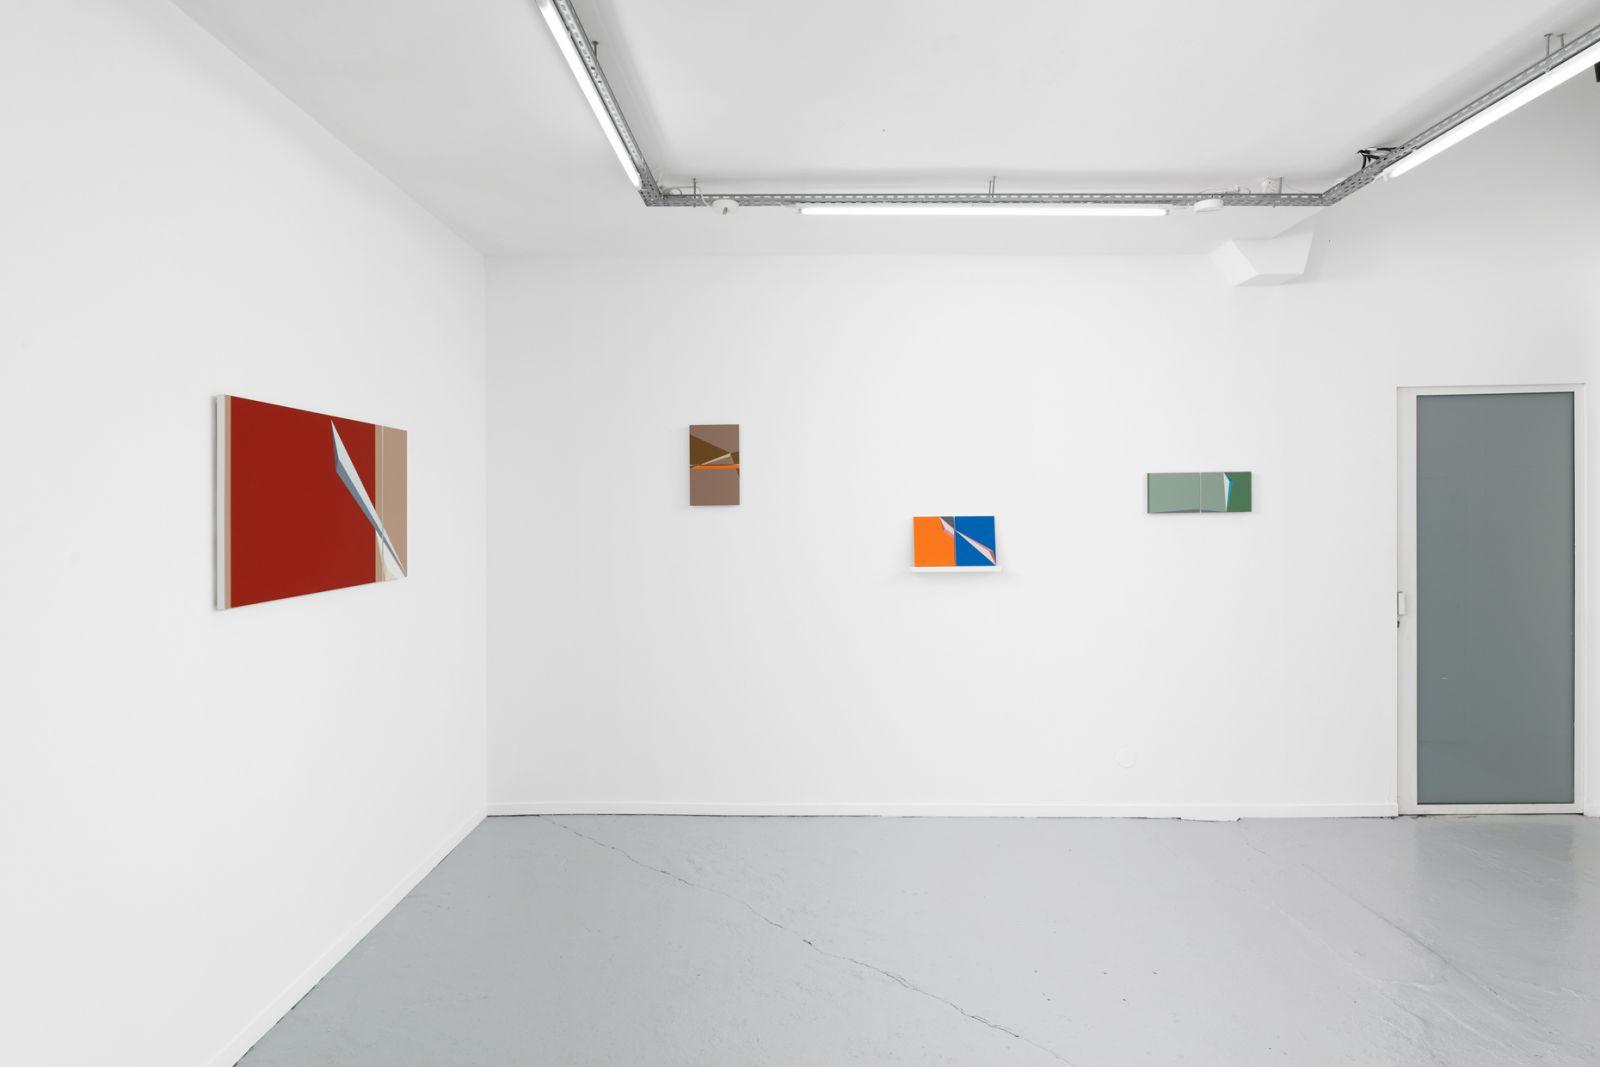 01-parties-fines-progress-gallery-vue-expo-5-aurelien-mole-web-3a448d179aaea575bf3270c4cd0c7fff